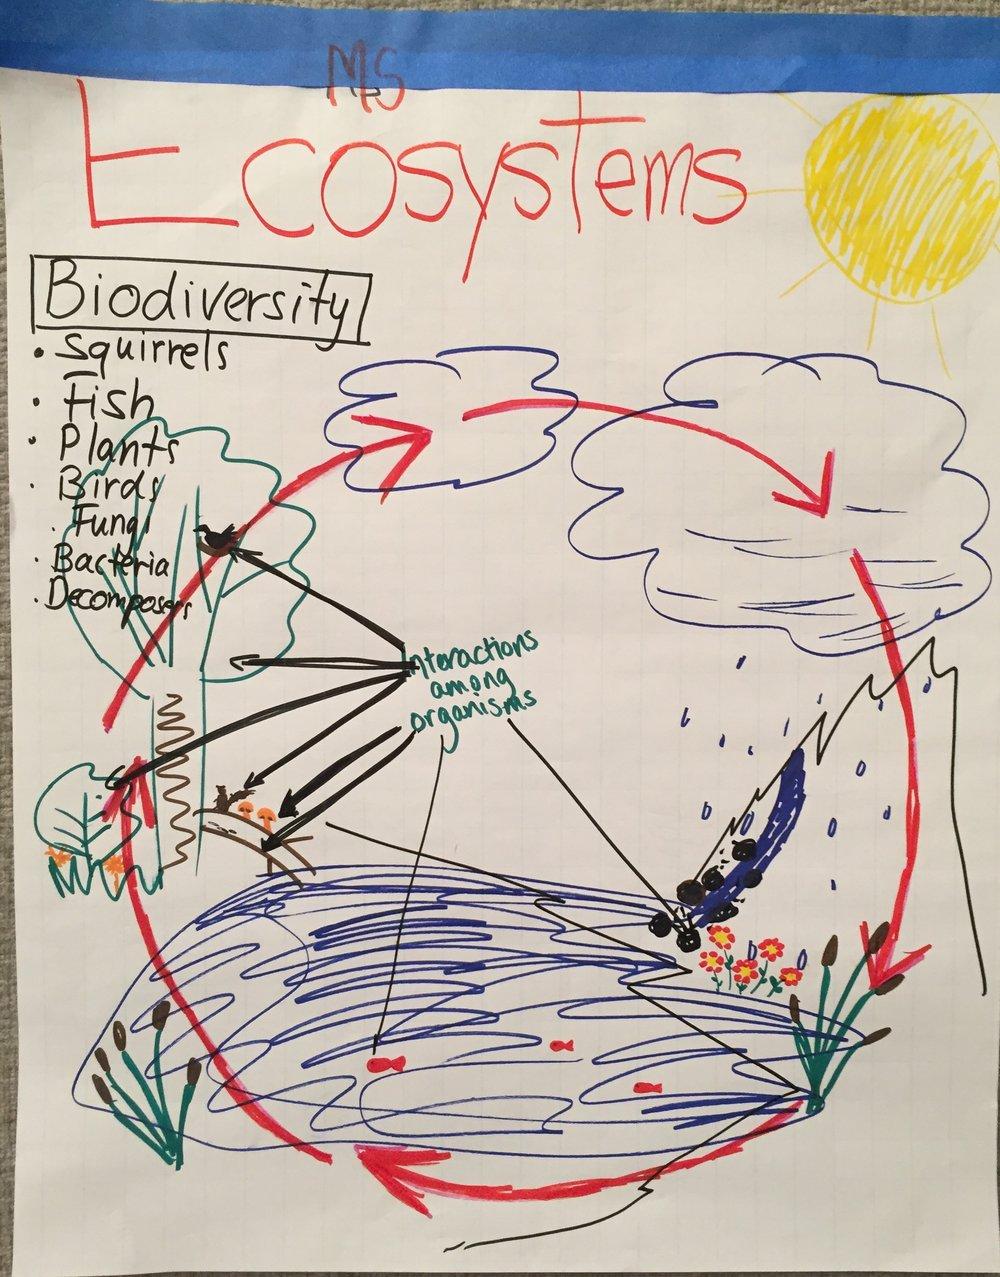 MS-Ecosystems.JPG